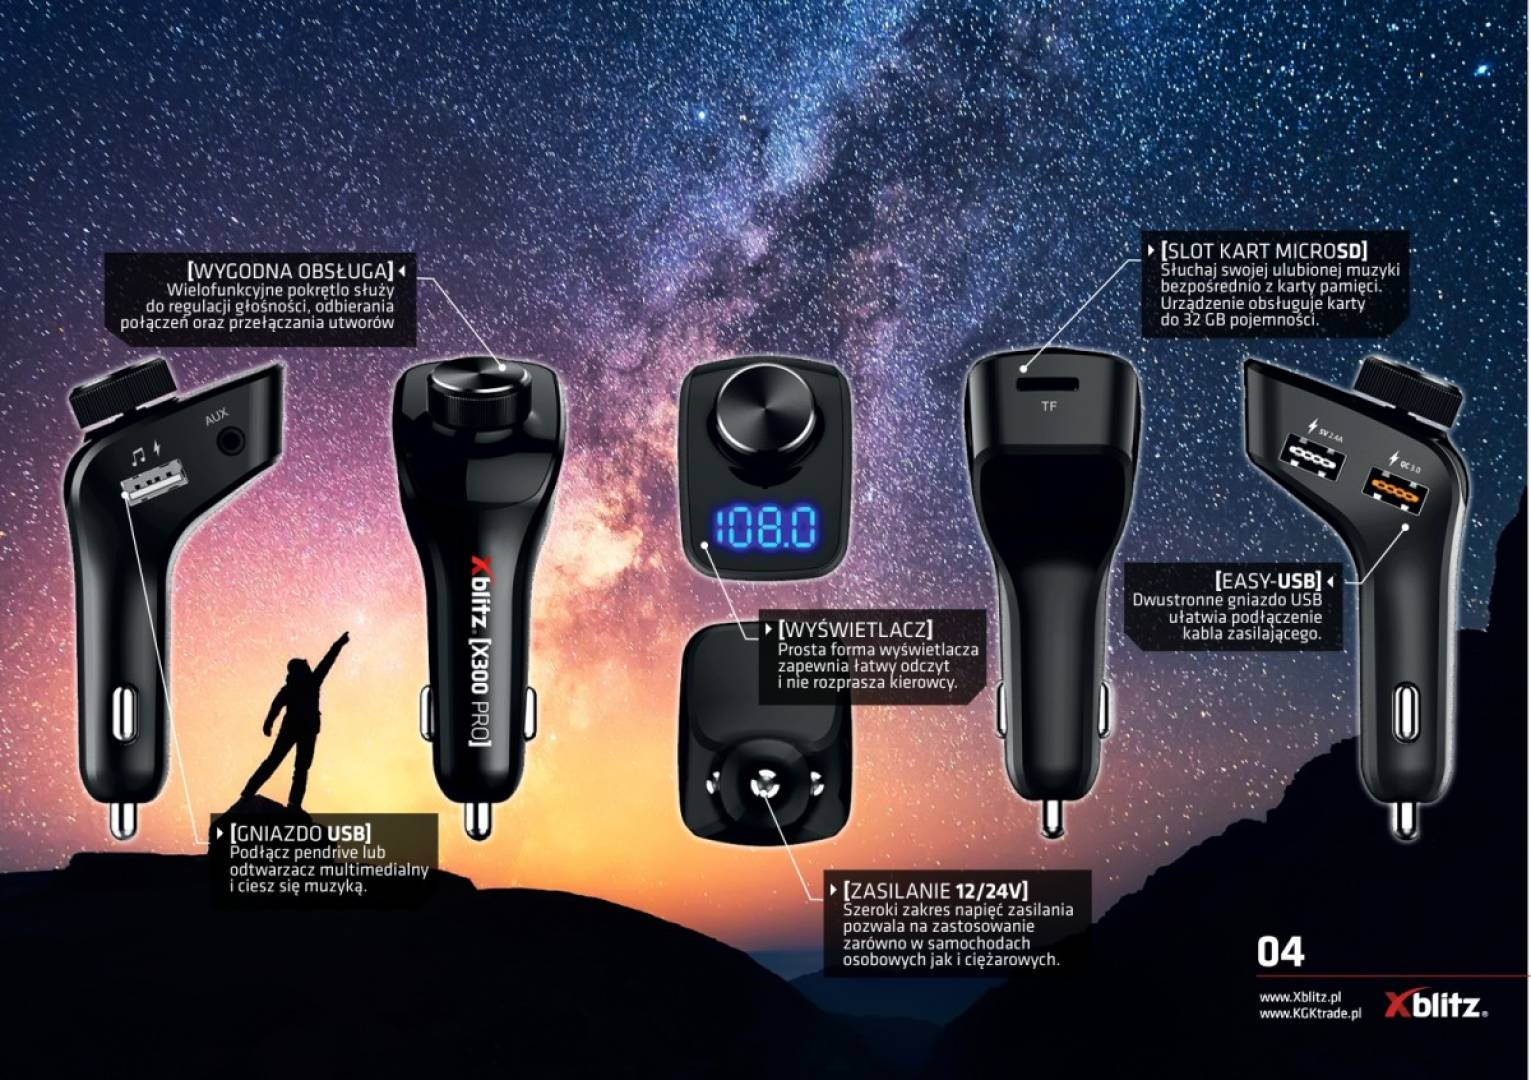 Transmiter X300 PRO FM, quick charge